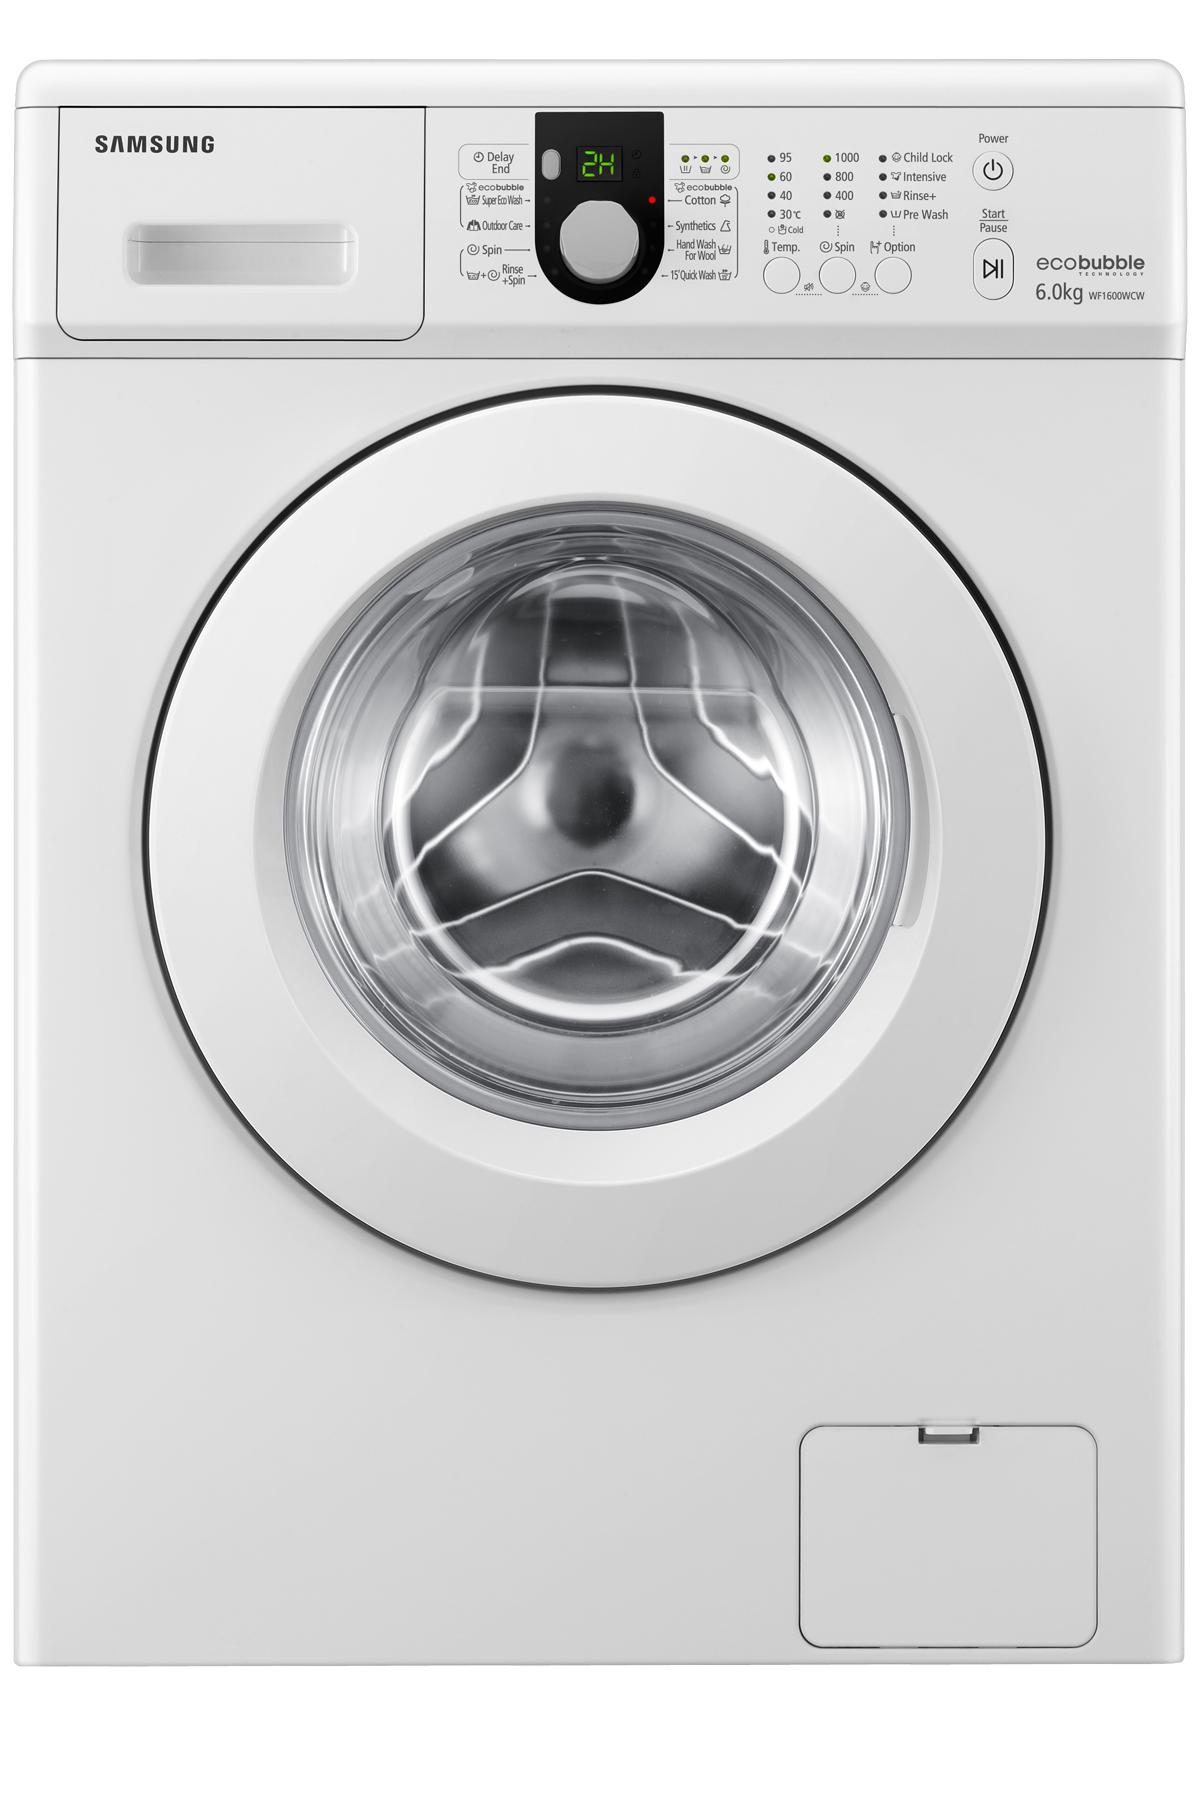 Aegis Bigbang Bubble Washer with Ceramic Heater, 6 kg, White